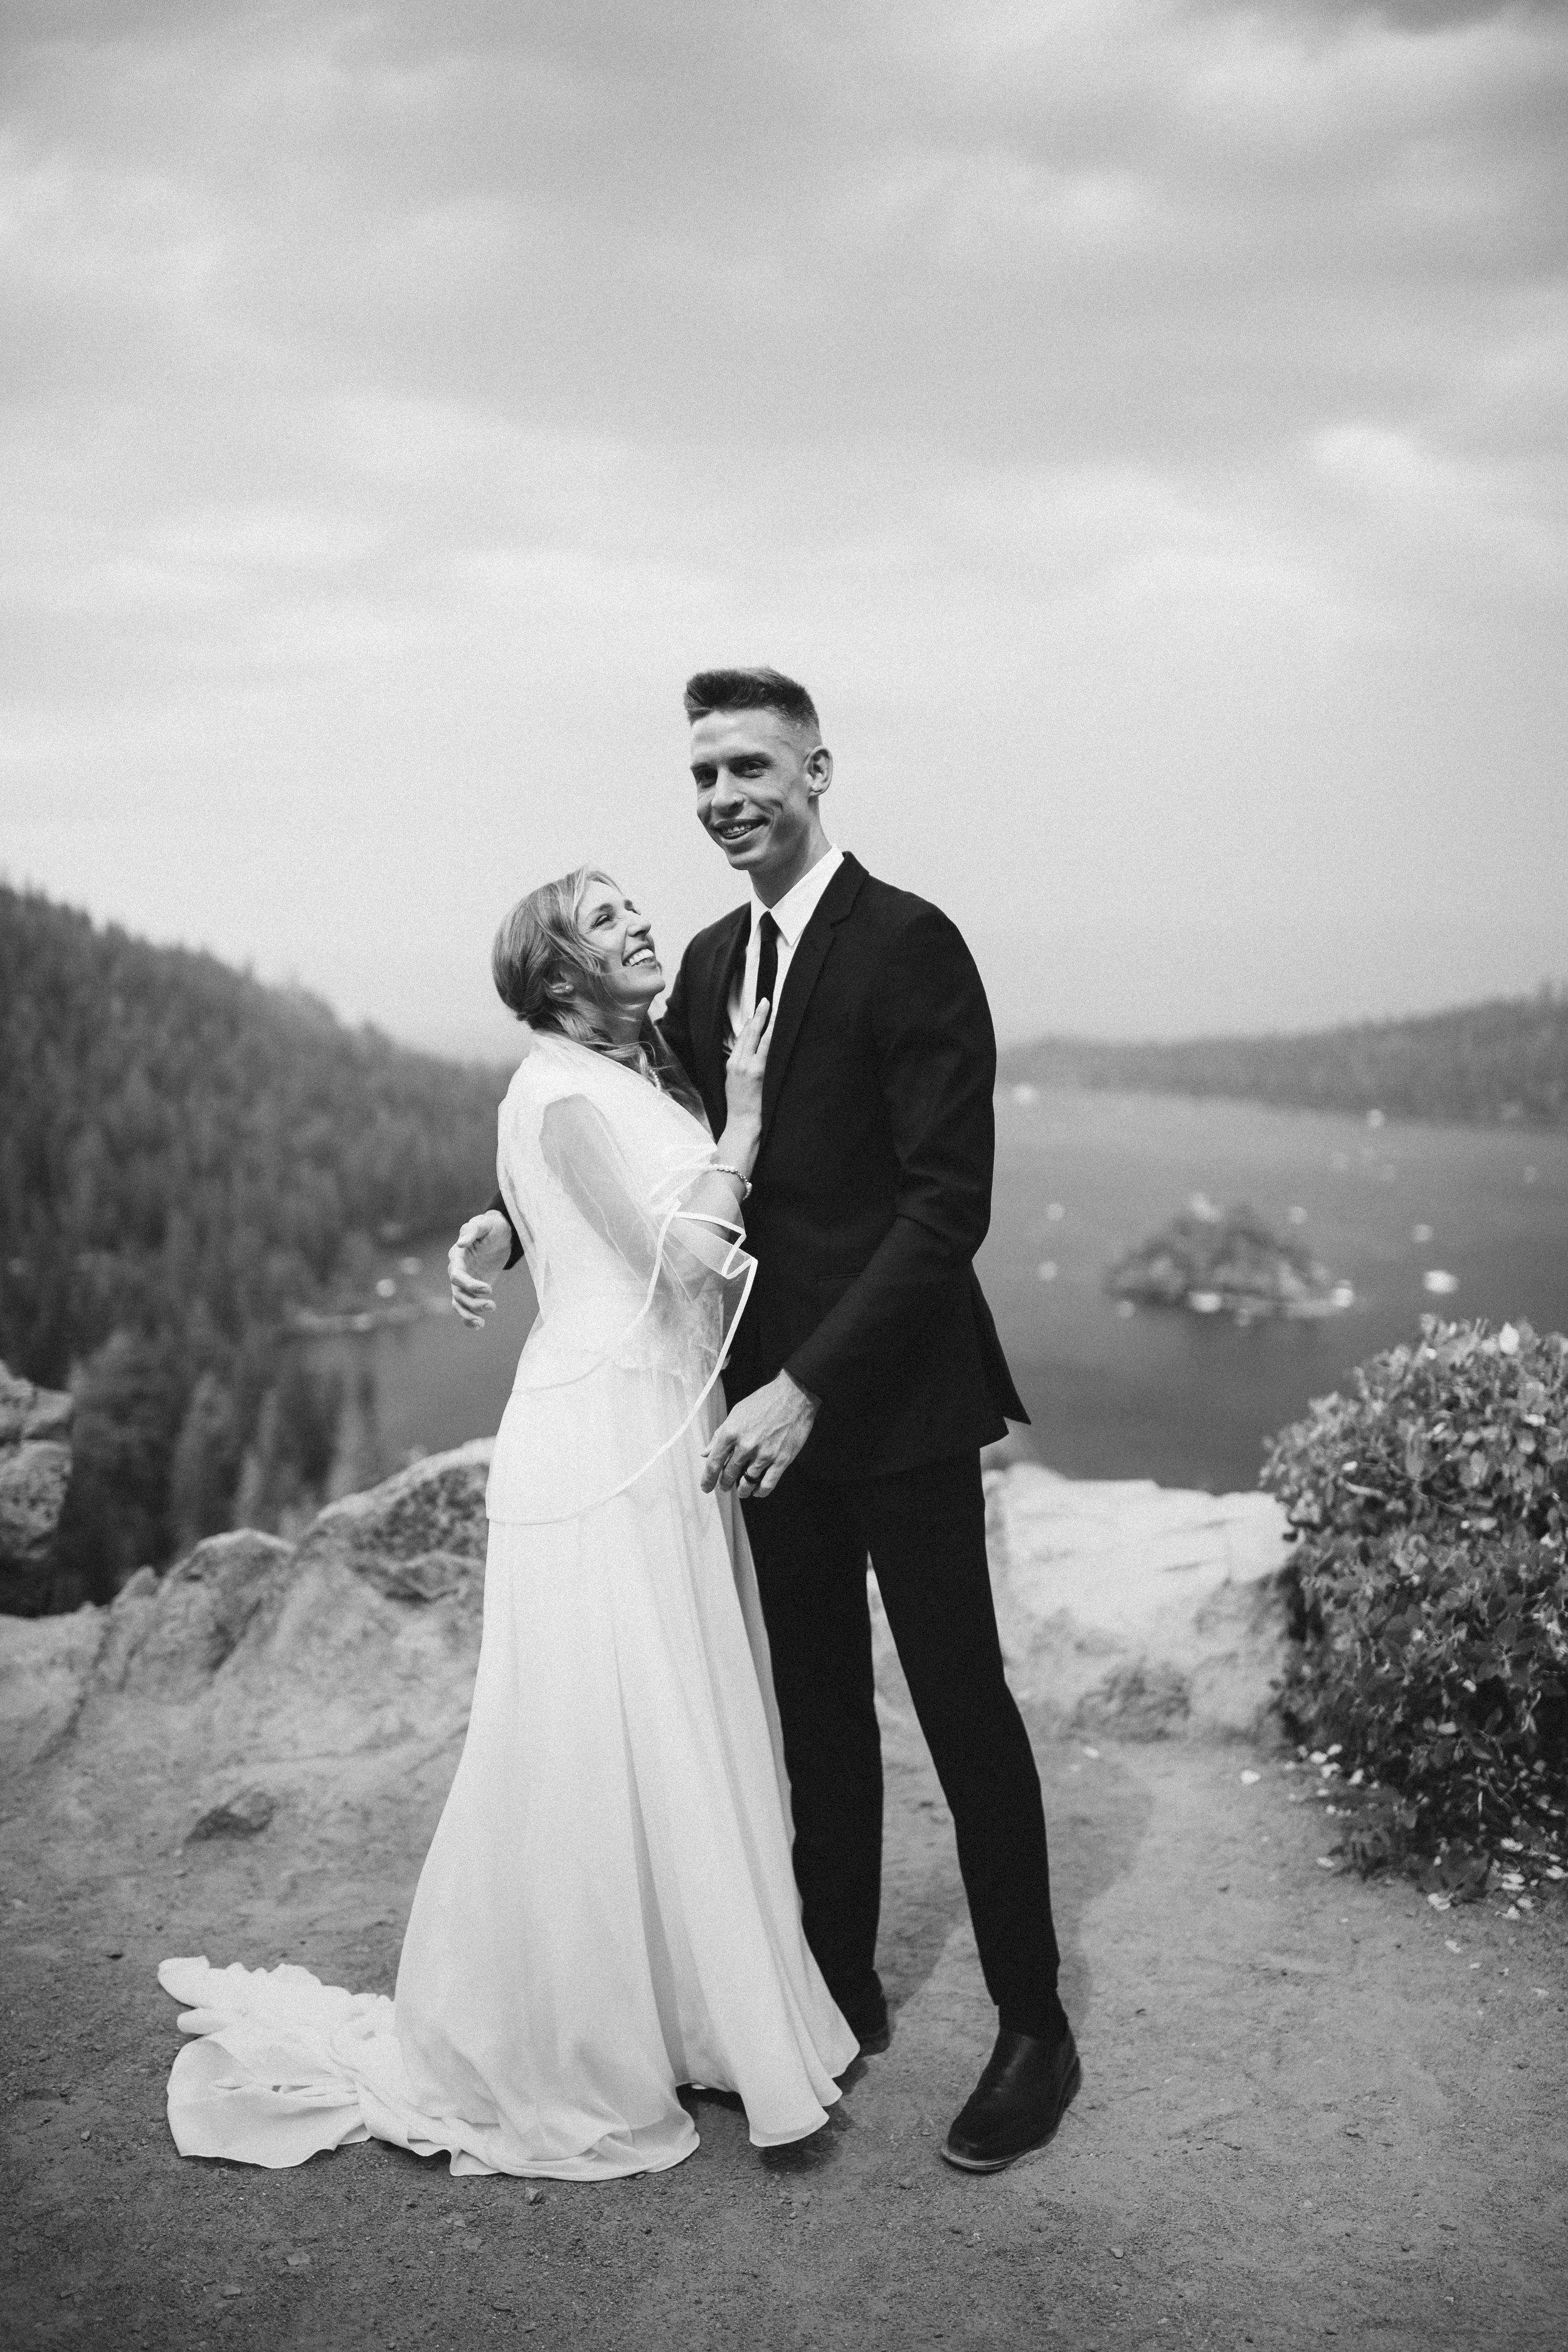 0M7A0772vildphotography-adventurewedding-adventurouswedding-tahoewedding-laketahoewedding-adventureelopement-laketahoeweddingphotographer-wedding-photographer-weddingphotographer-Chase-Sam.jpg